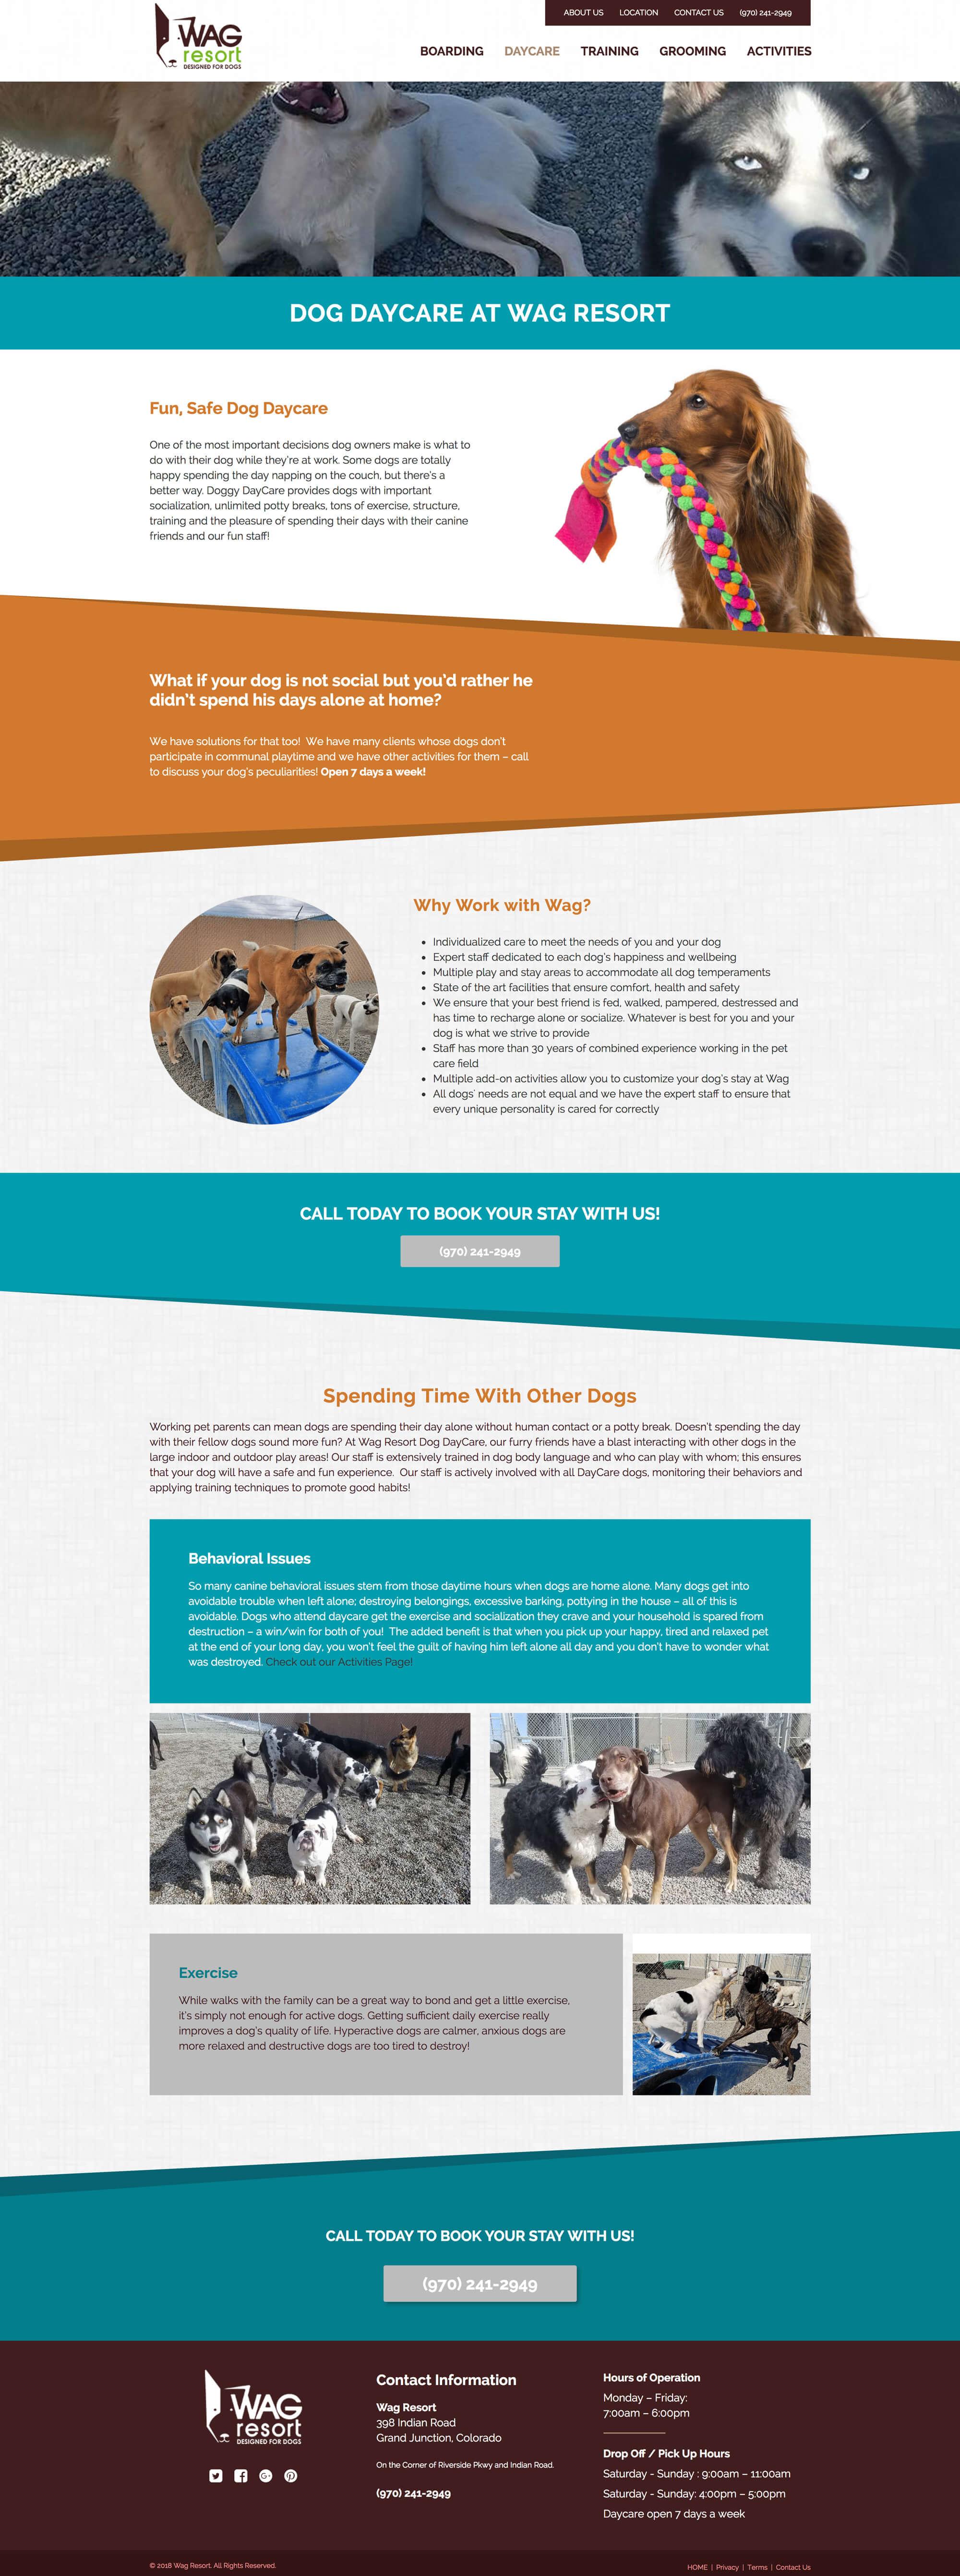 Wag Resort - A-Train Marketing | Fort Collins Colorado